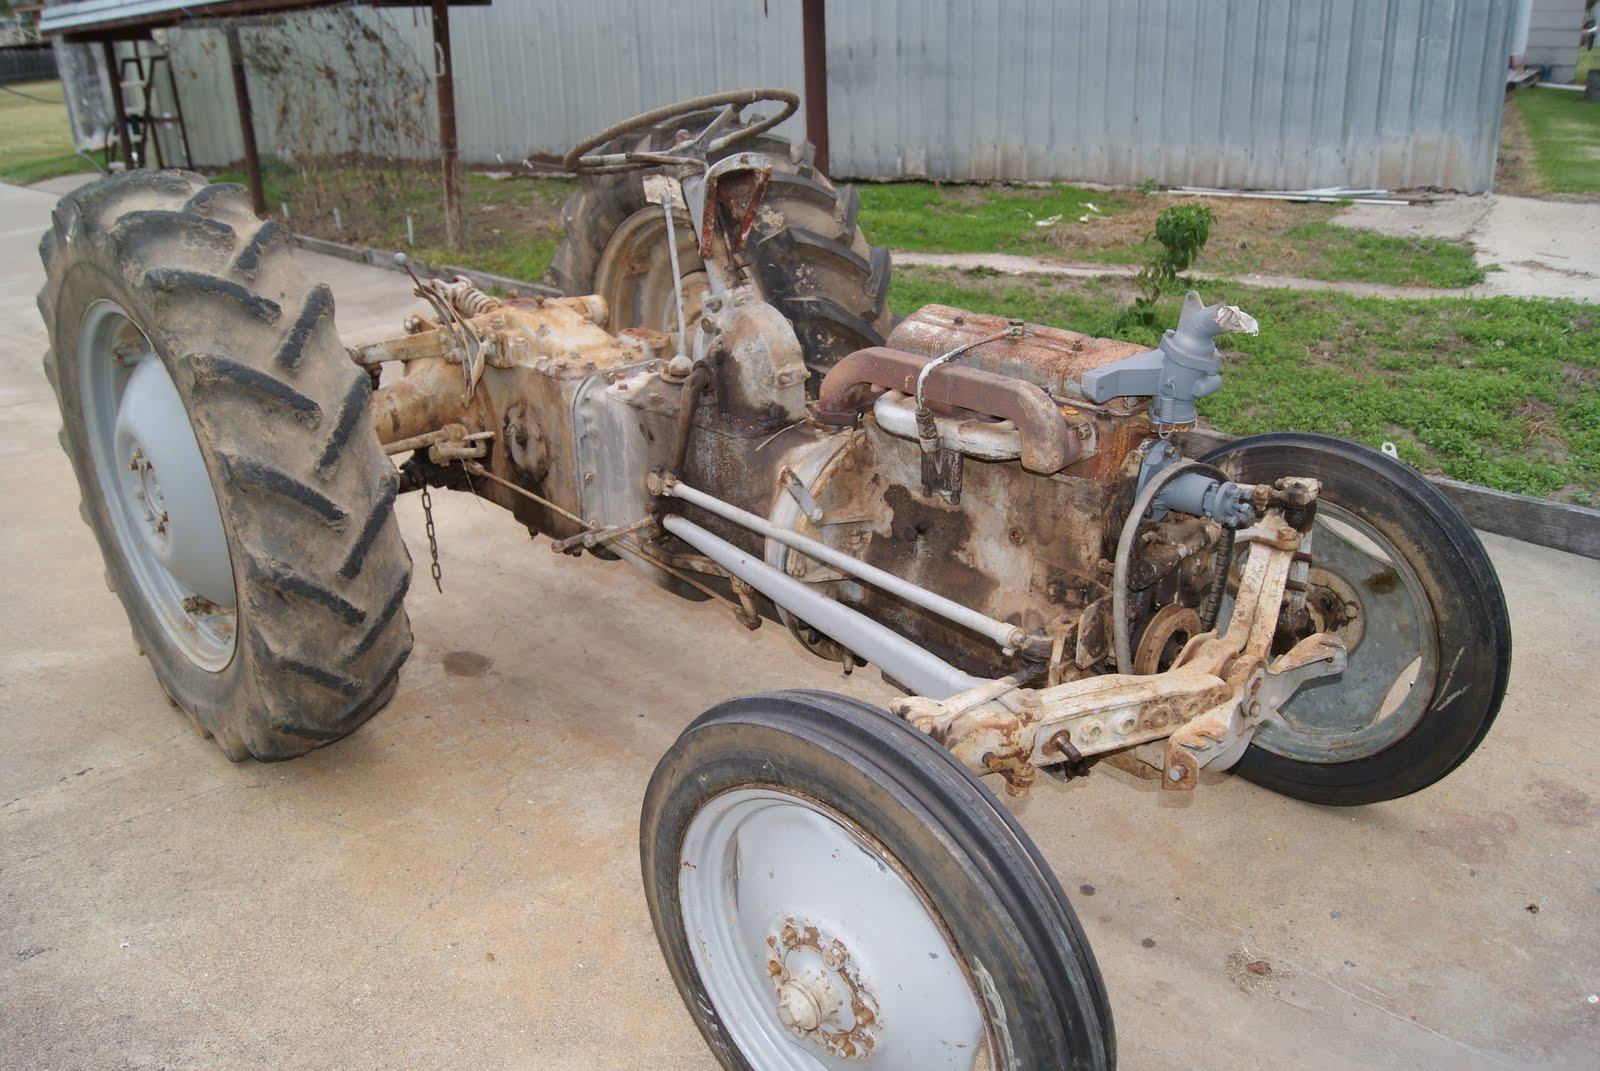 http://1.bp.blogspot.com/-tT2_Vvkse8c/TdhQVXM7qYI/AAAAAAAAADE/jJstQF4kQMA/s1600/Tractor+1.jpg